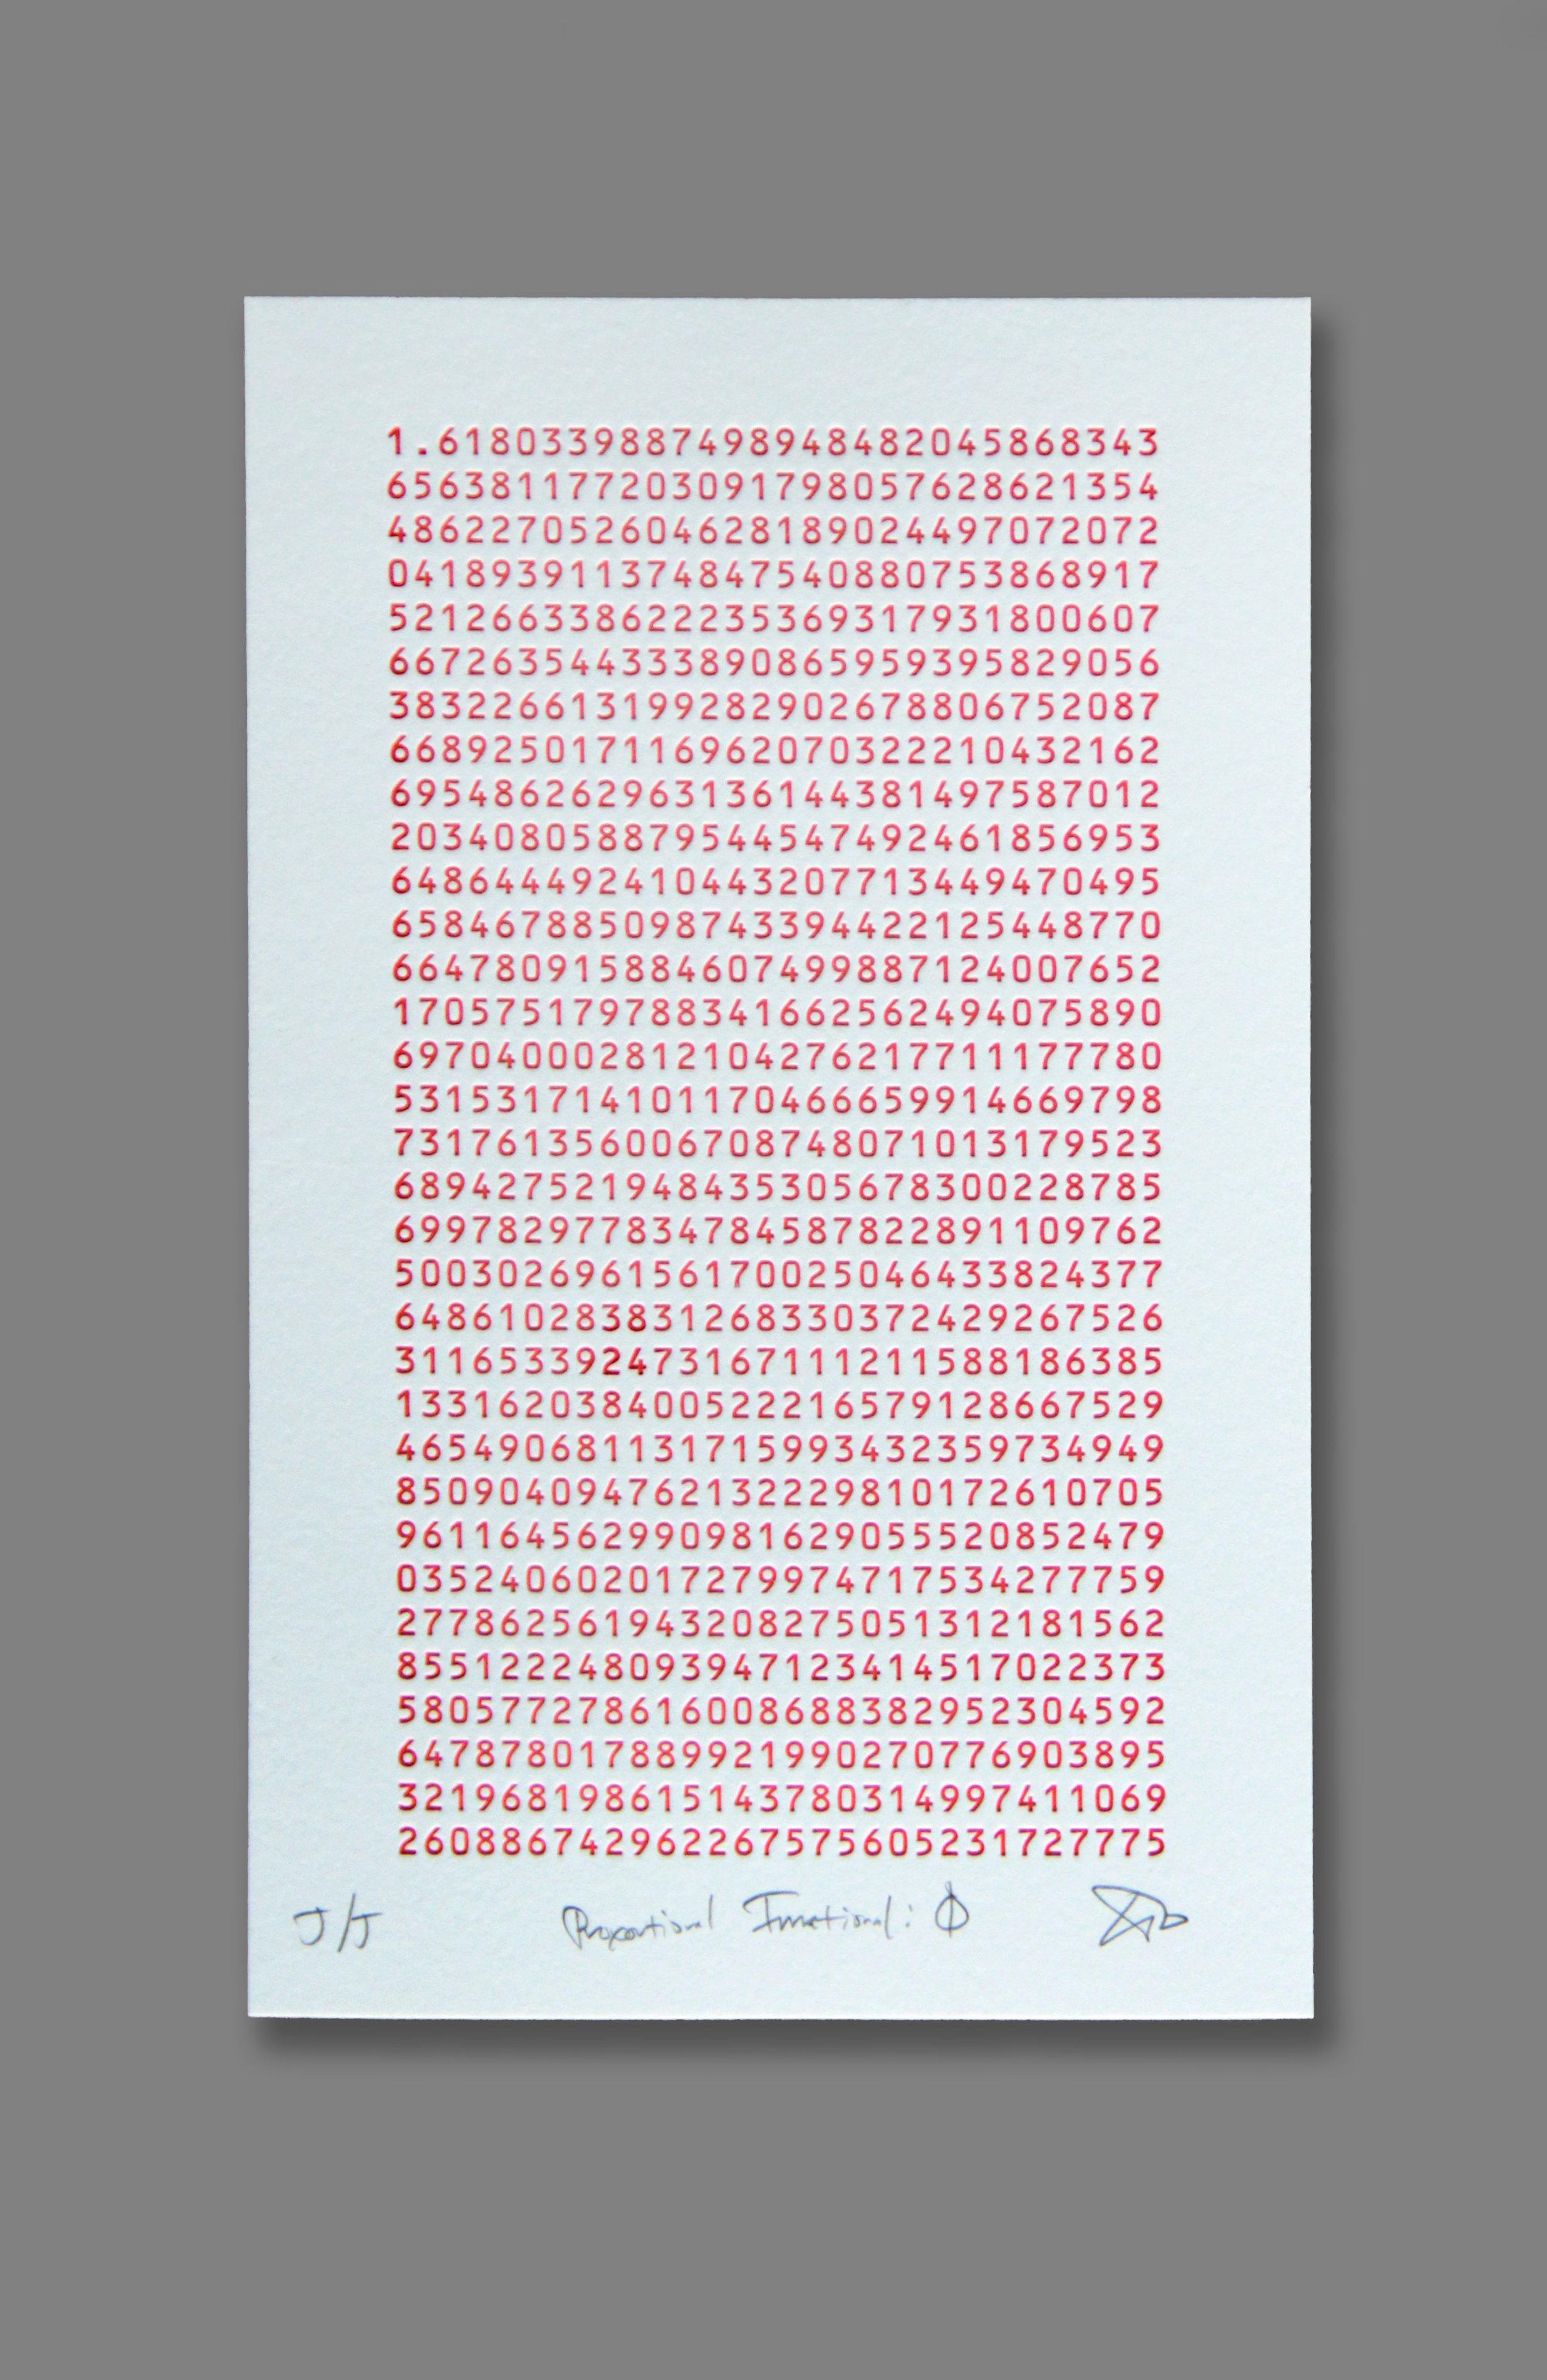 "Ted Ollier ,  Proportional Irrational: Φ (Phi)  (1/40), letterpress on paper, 13"" x 9 1/2"" framed, $250"